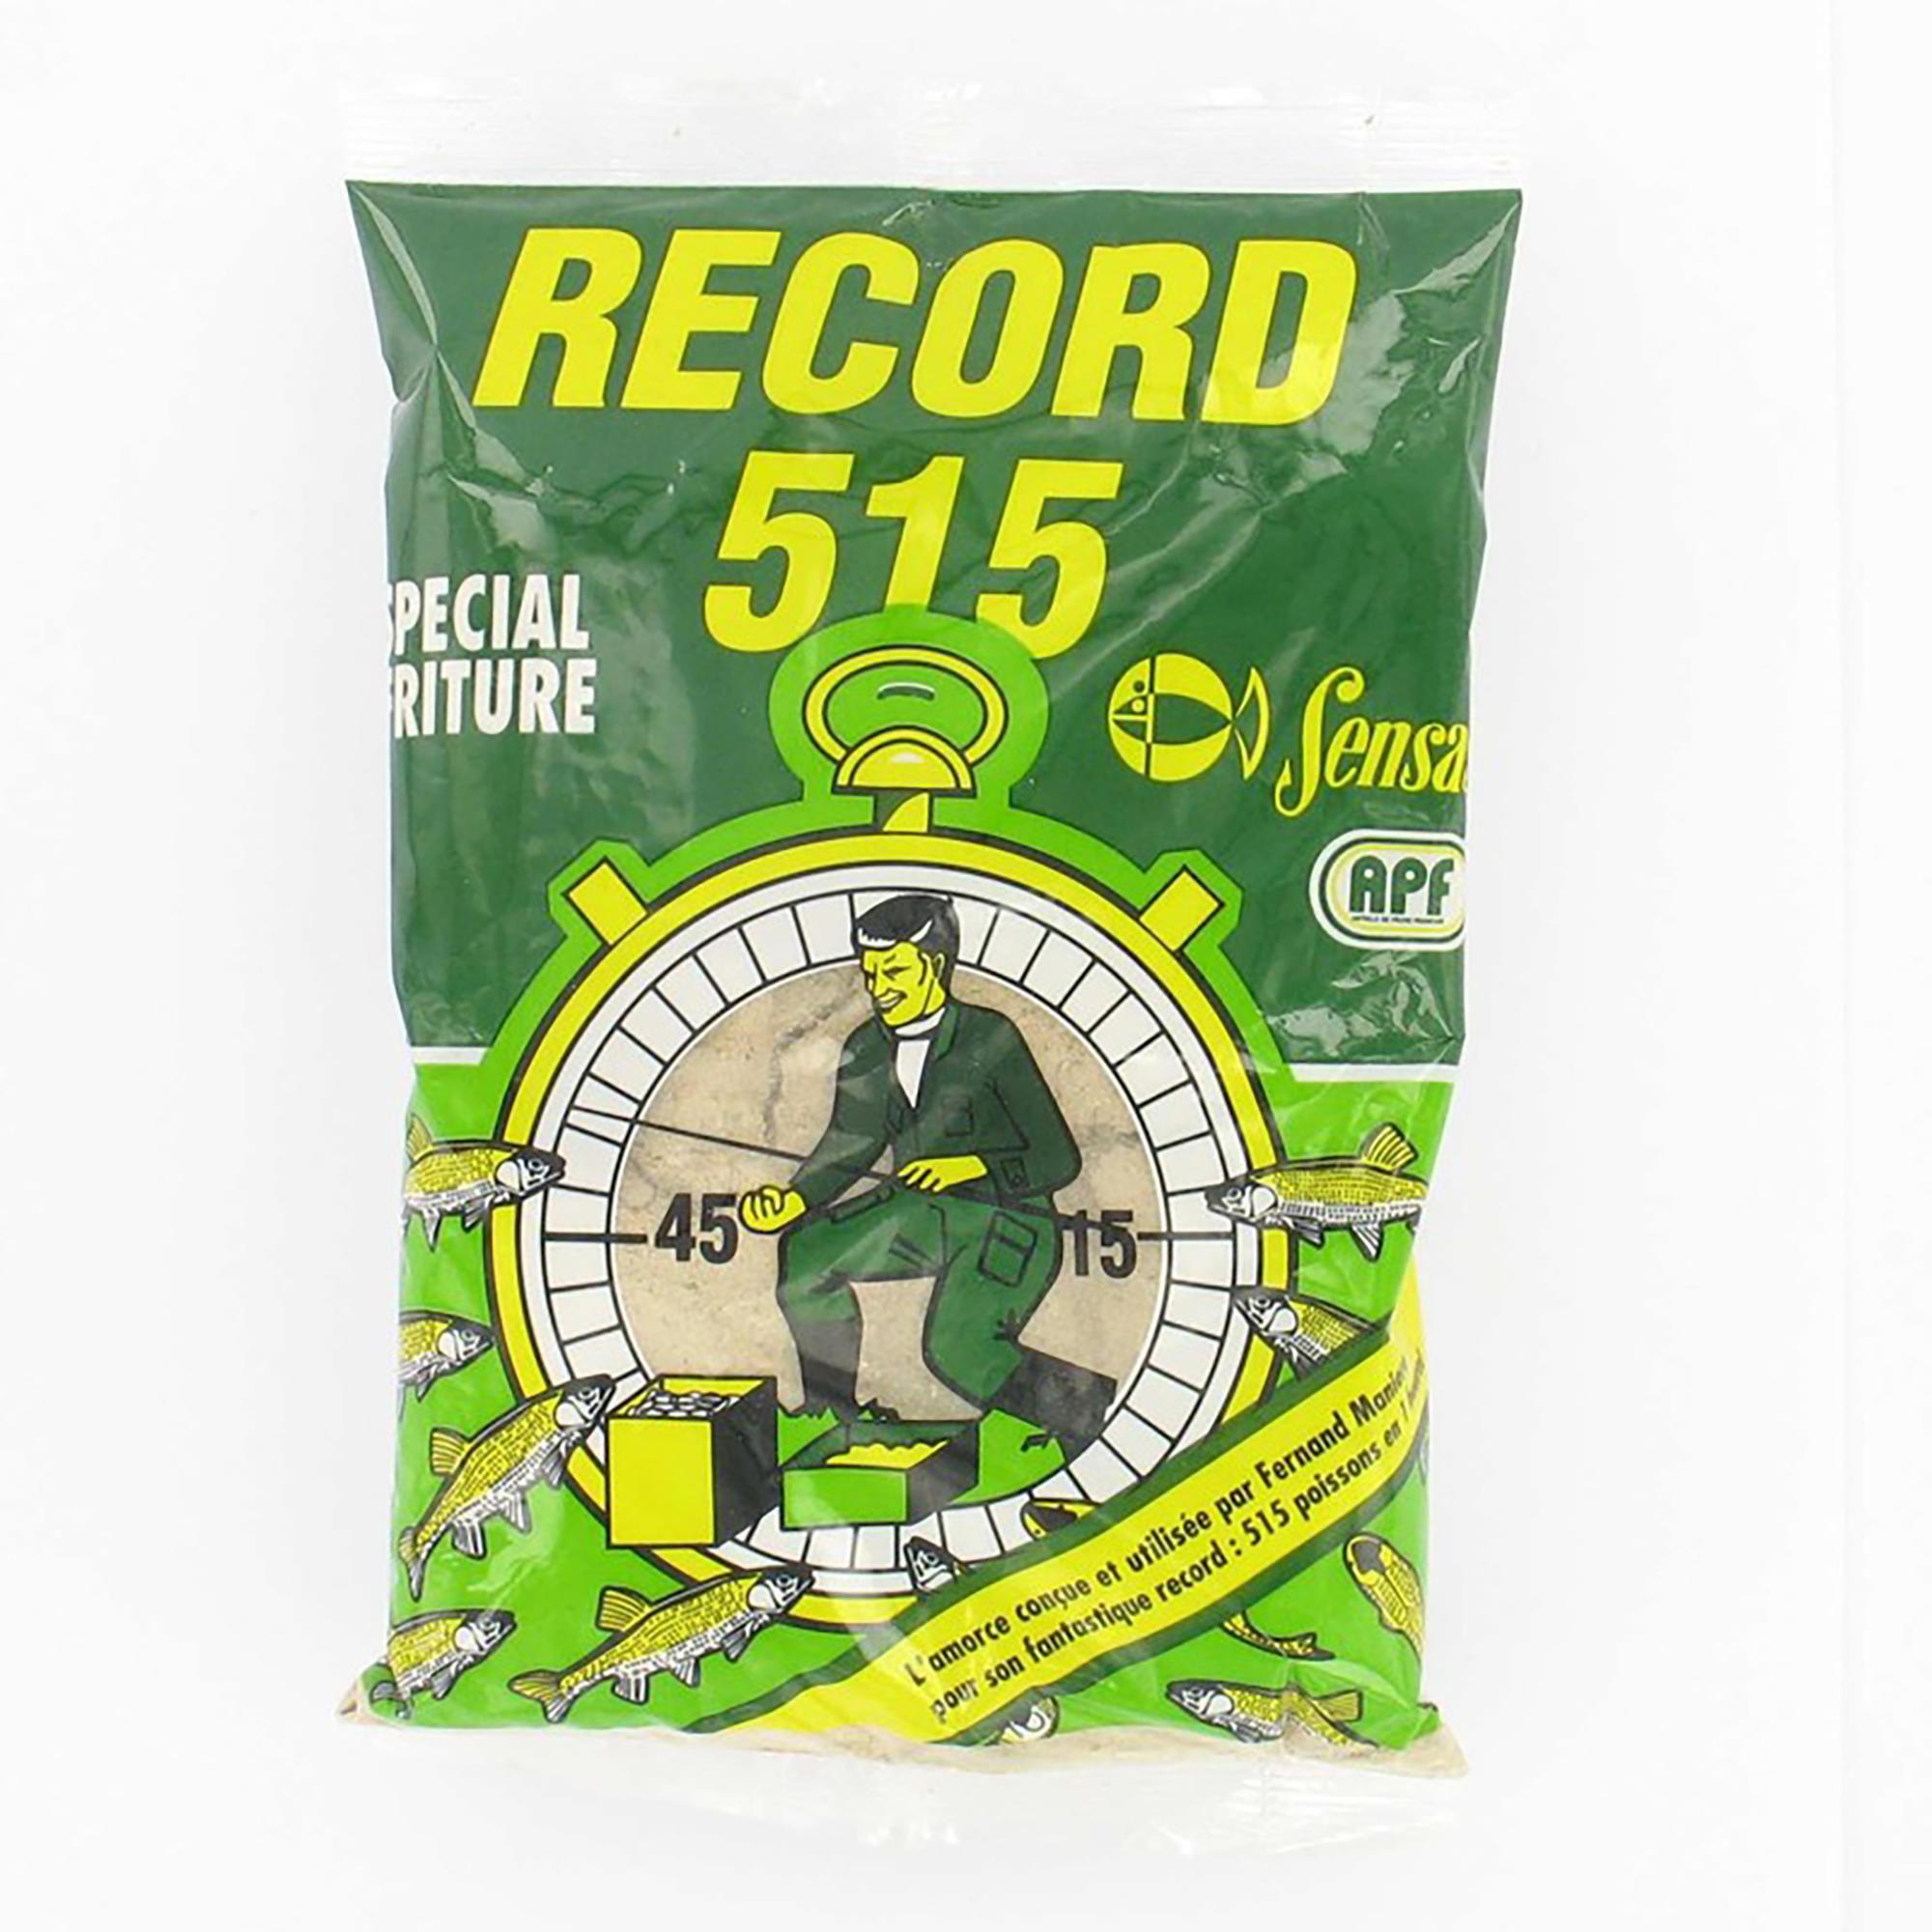 Zanęta Record 515 żółta 0,8 kg